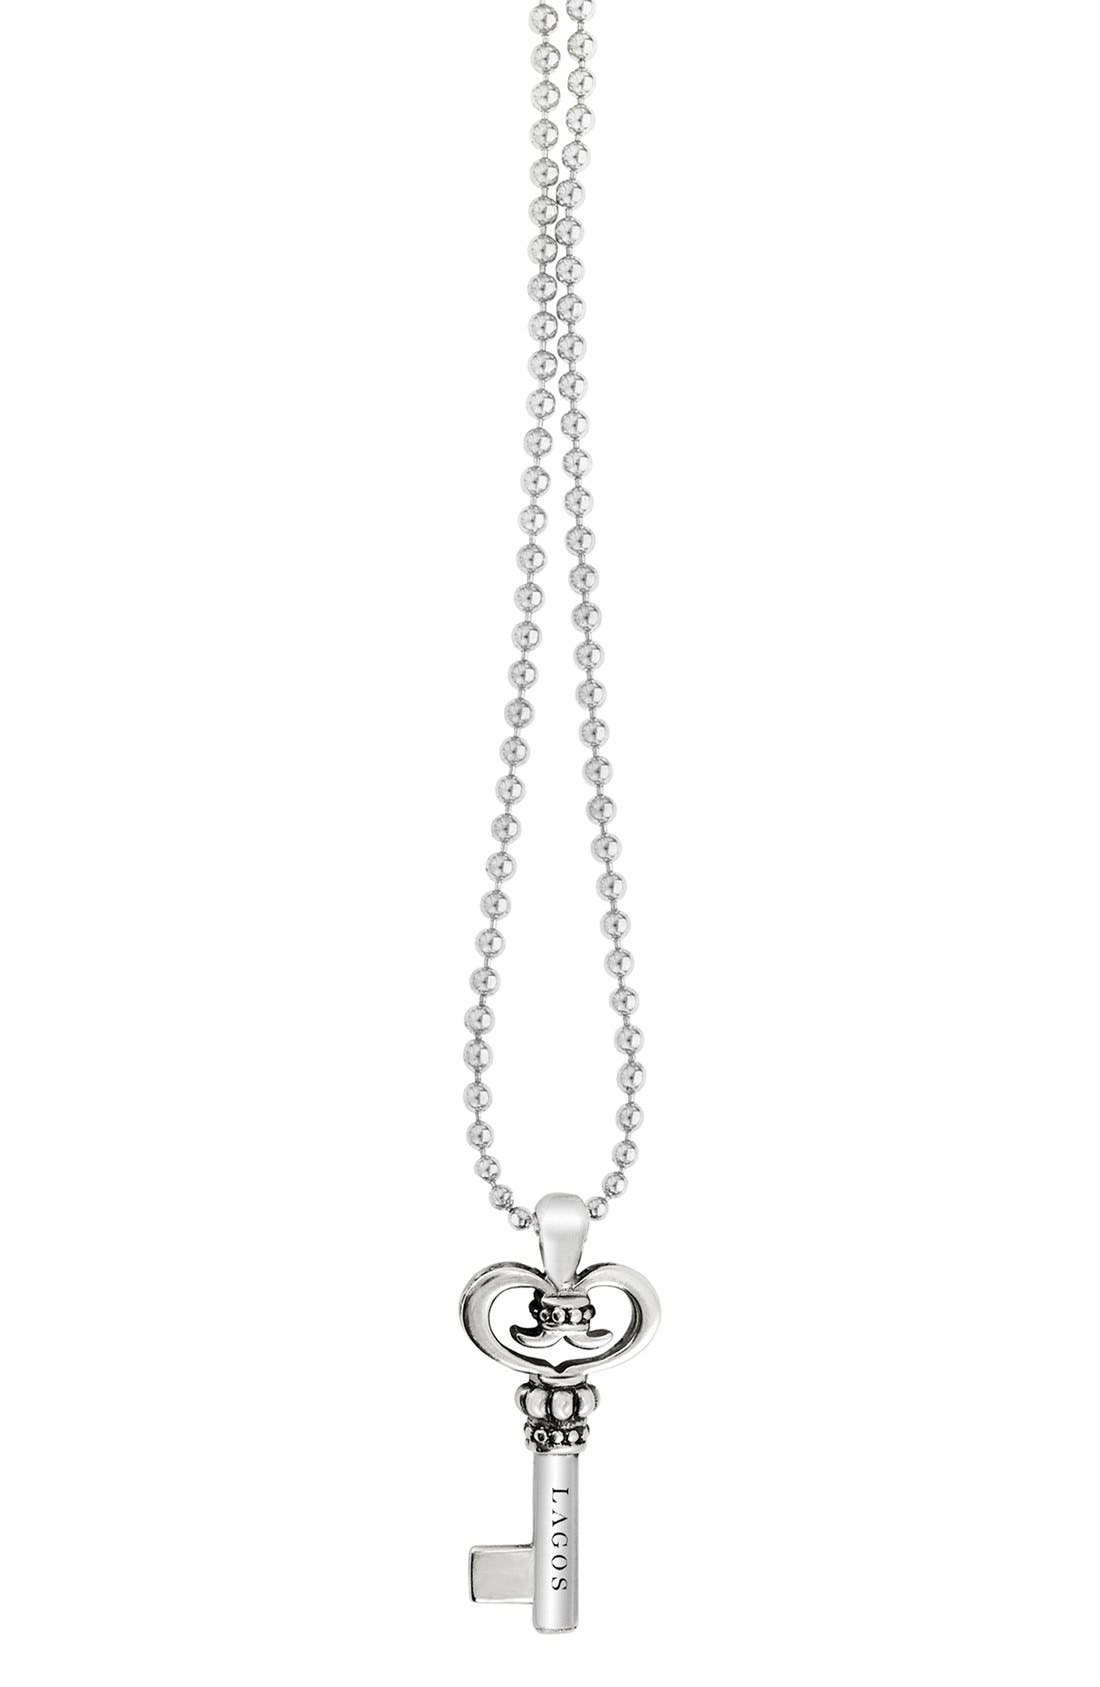 Sterling Silver Key Long Strand Pendant Necklace,                             Alternate thumbnail 6, color,                             KEY